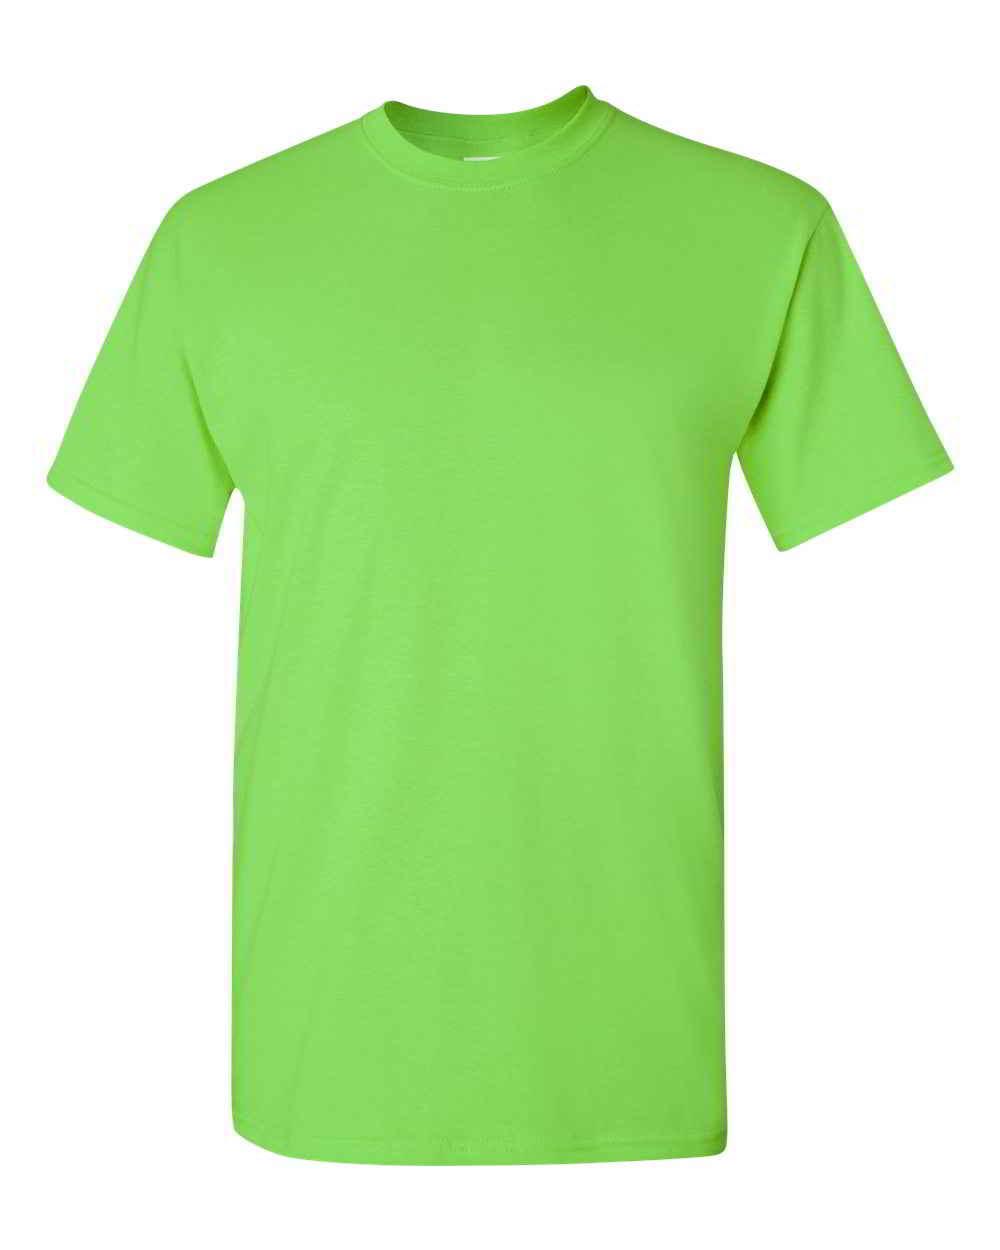 Gildan-Heavy-Cotton-Short-Sleeve-Mens-Green-T-Shirts-5000 thumbnail 19